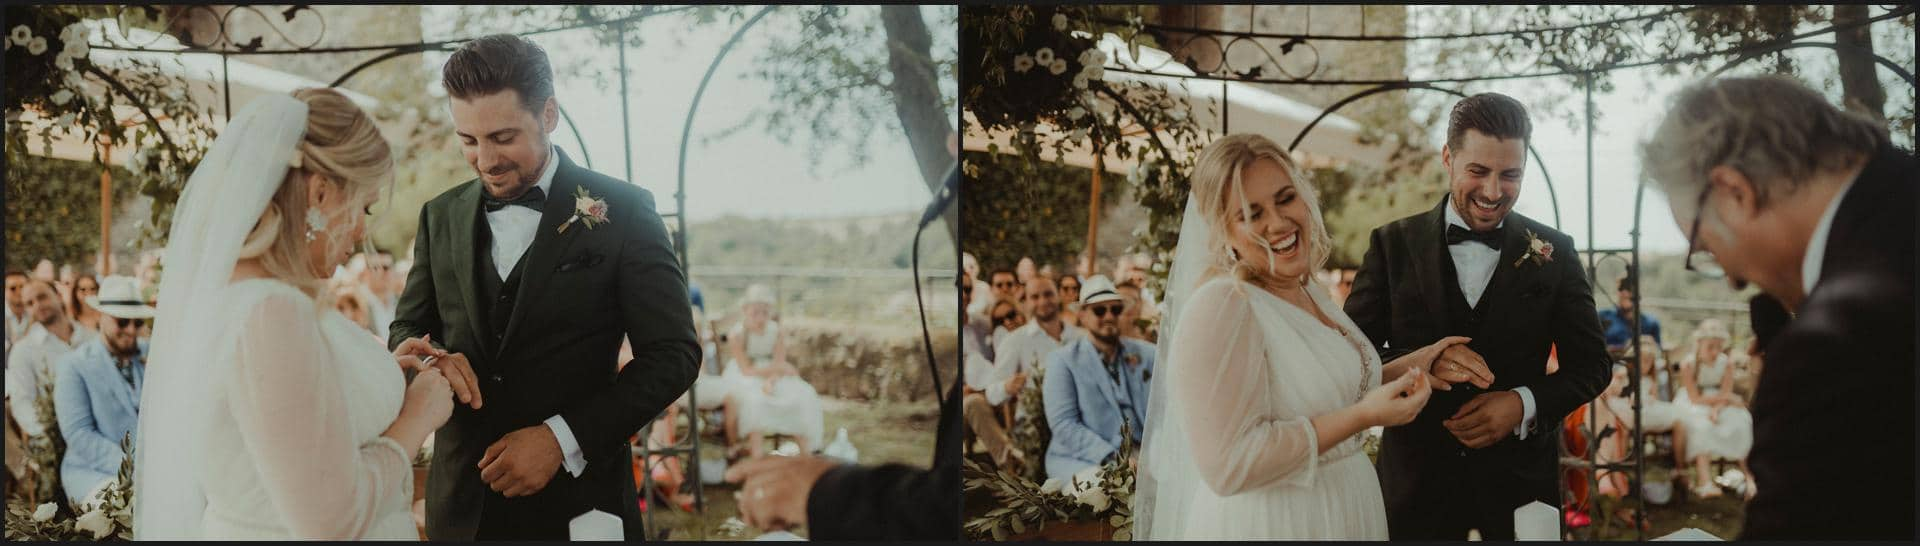 borgo di tragliata, wedding, rome, wedding in rome, exchanging of the rings, wedding in italy, destination wedding in italy